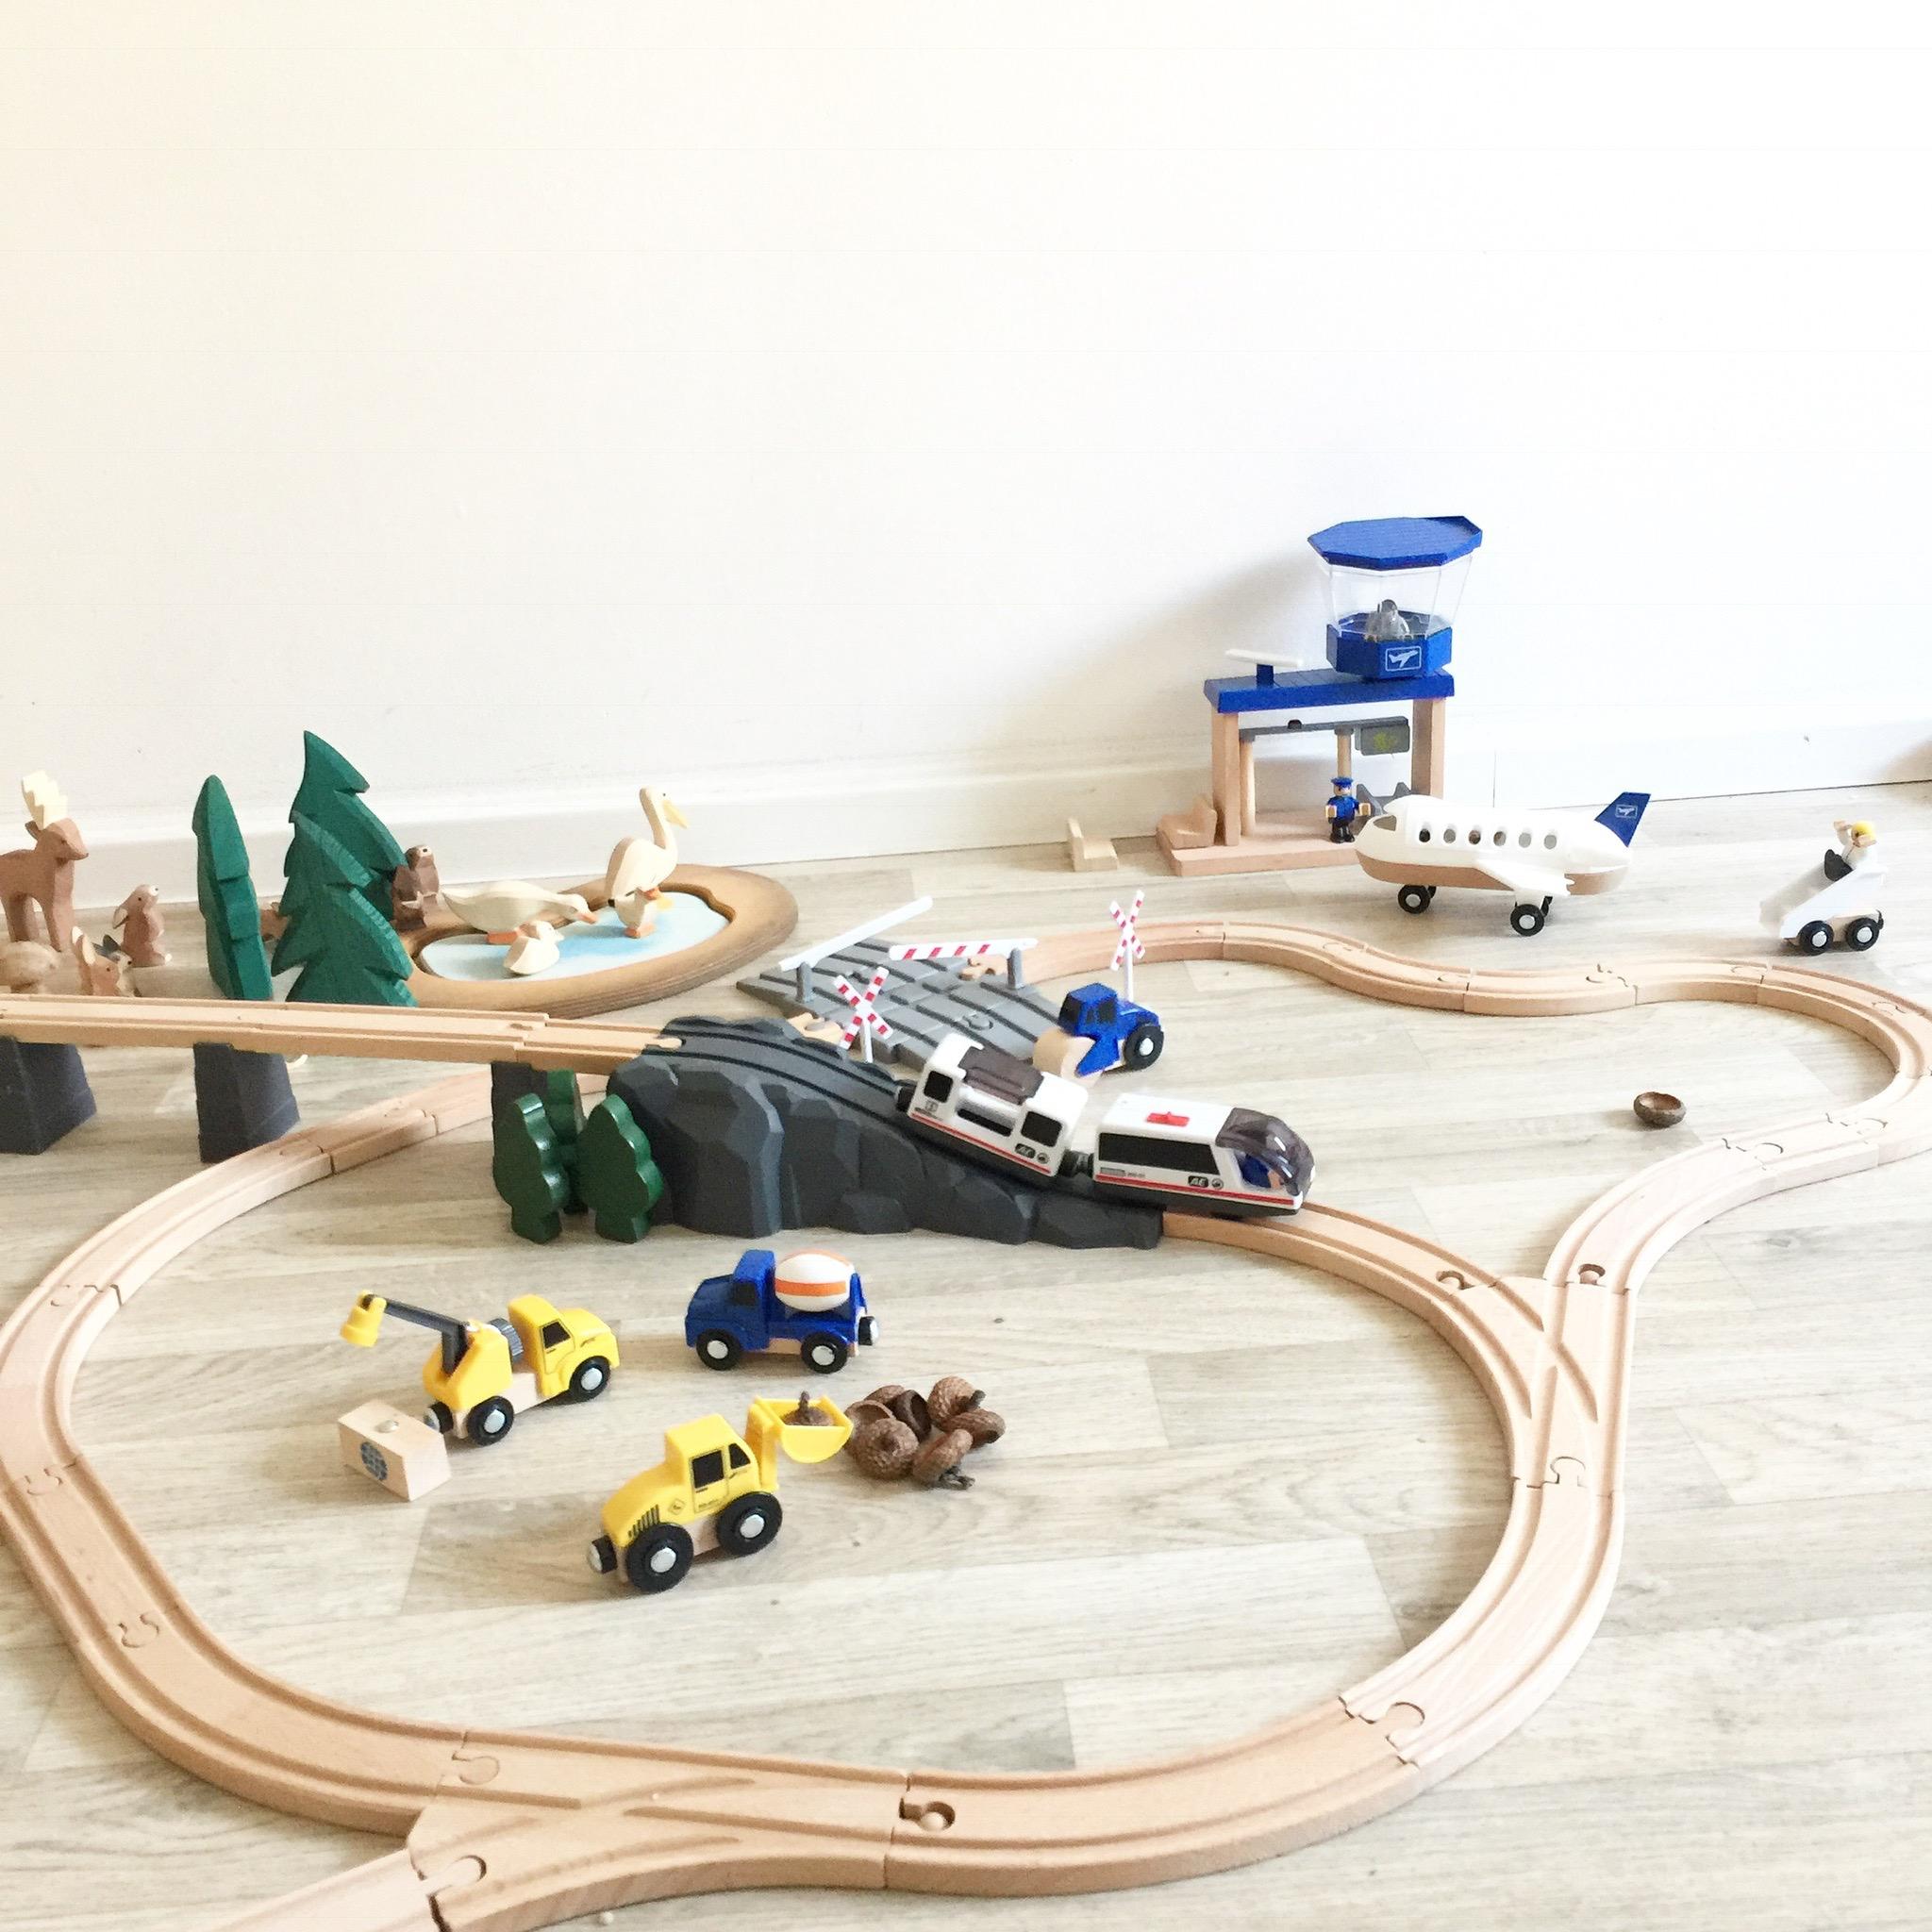 Eisenbahn lidl